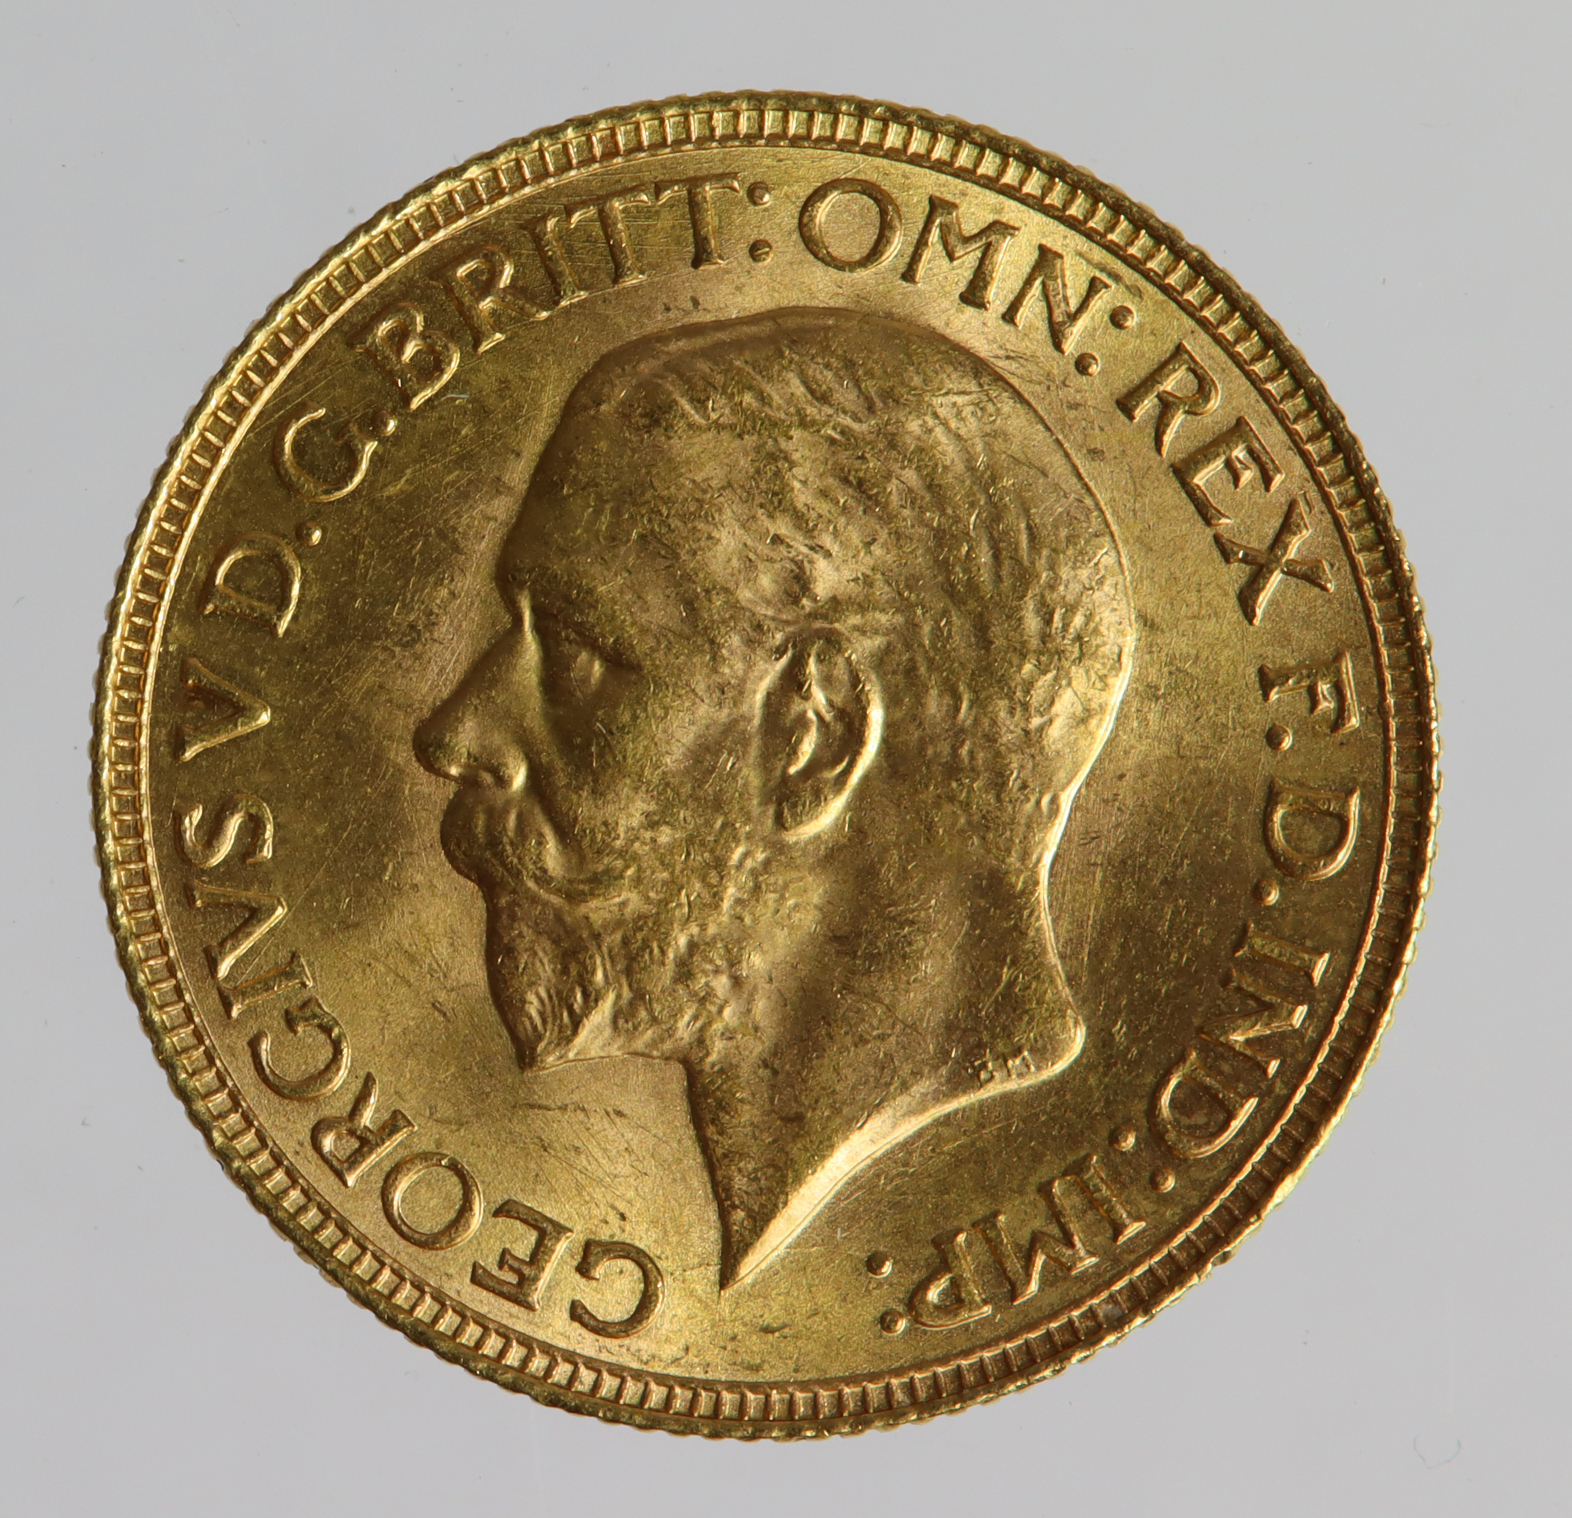 Sovereign 1930 SA, Pretoria Mint, South Africa, UNC